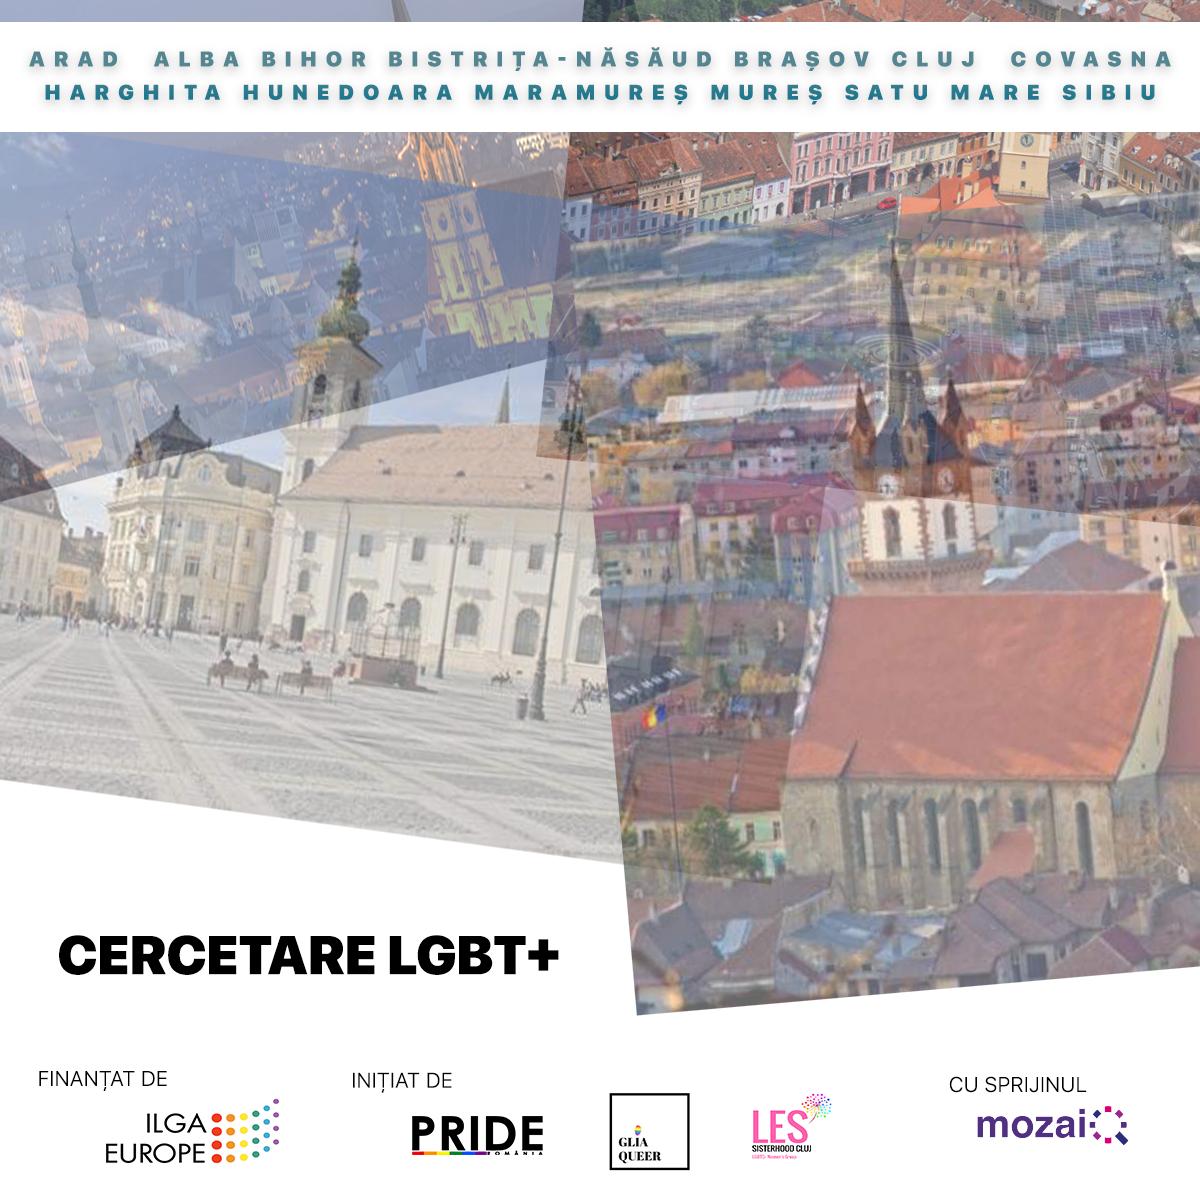 Cercetare privind experiența LGBT+ din Transilvania